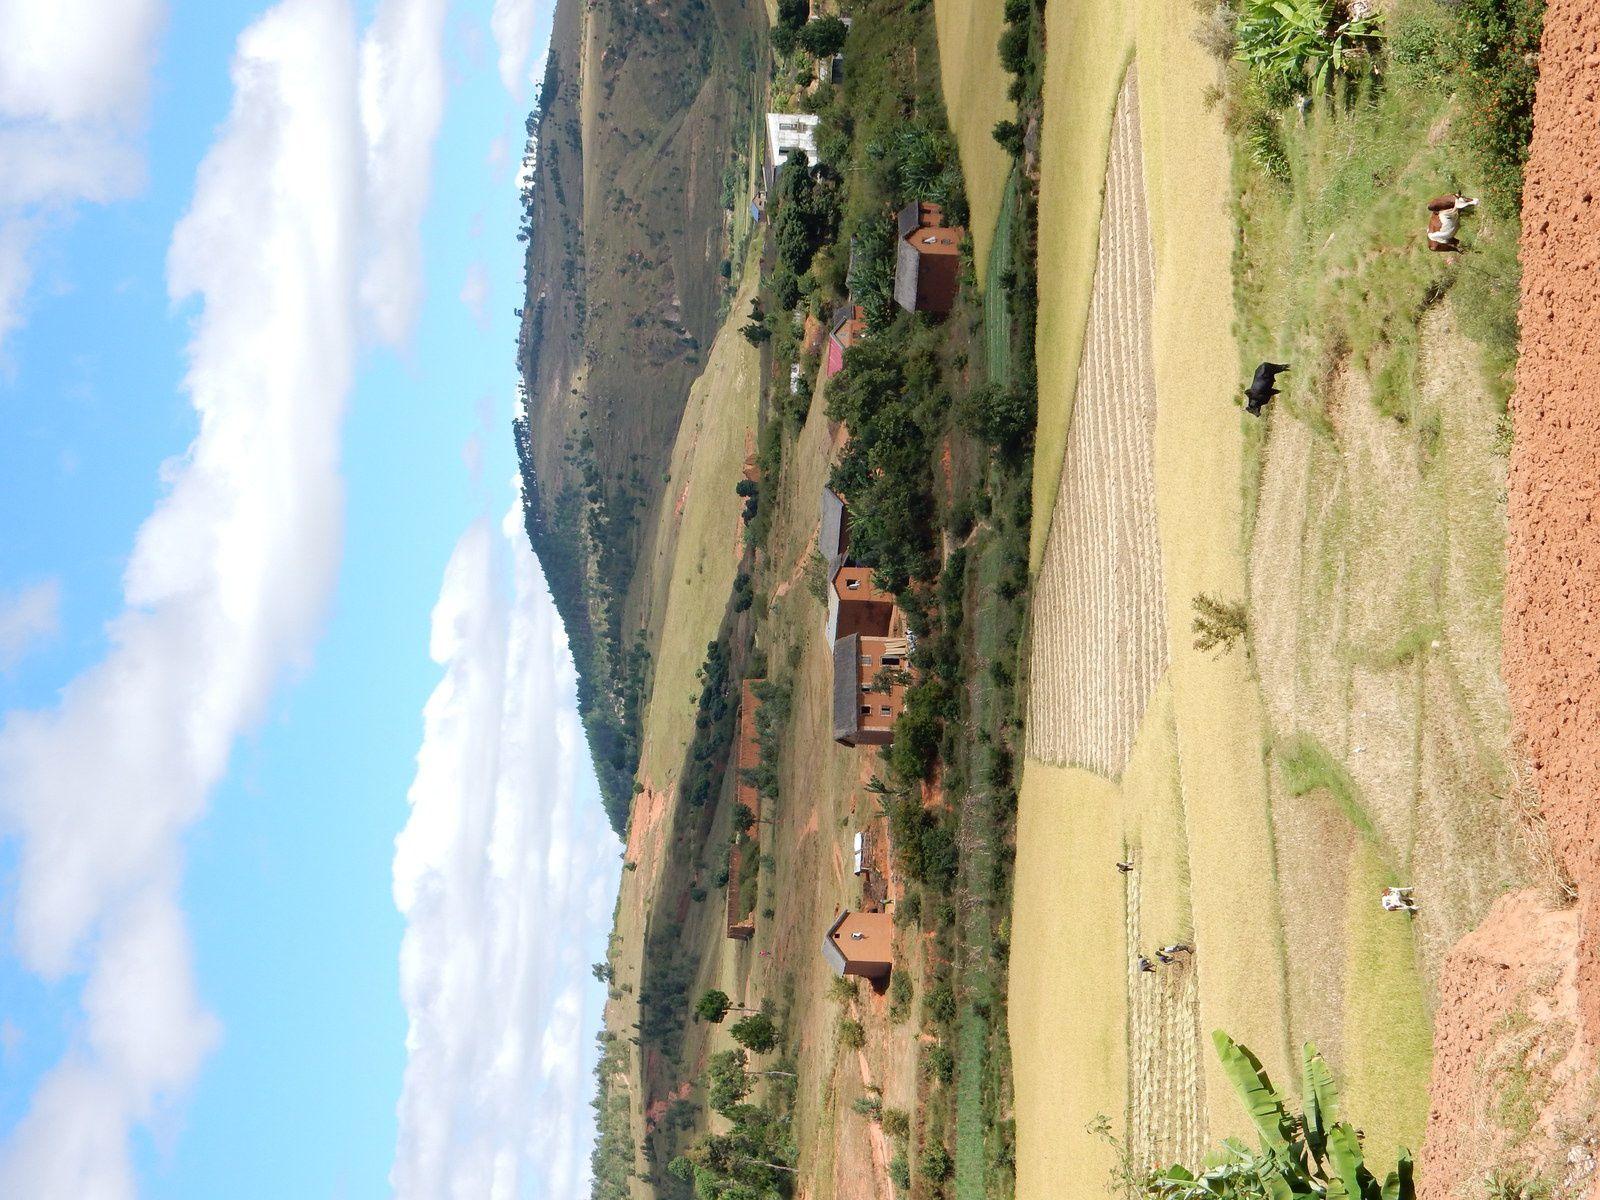 Colline royale d'Antanarivo, Madagascar - Avril 2016